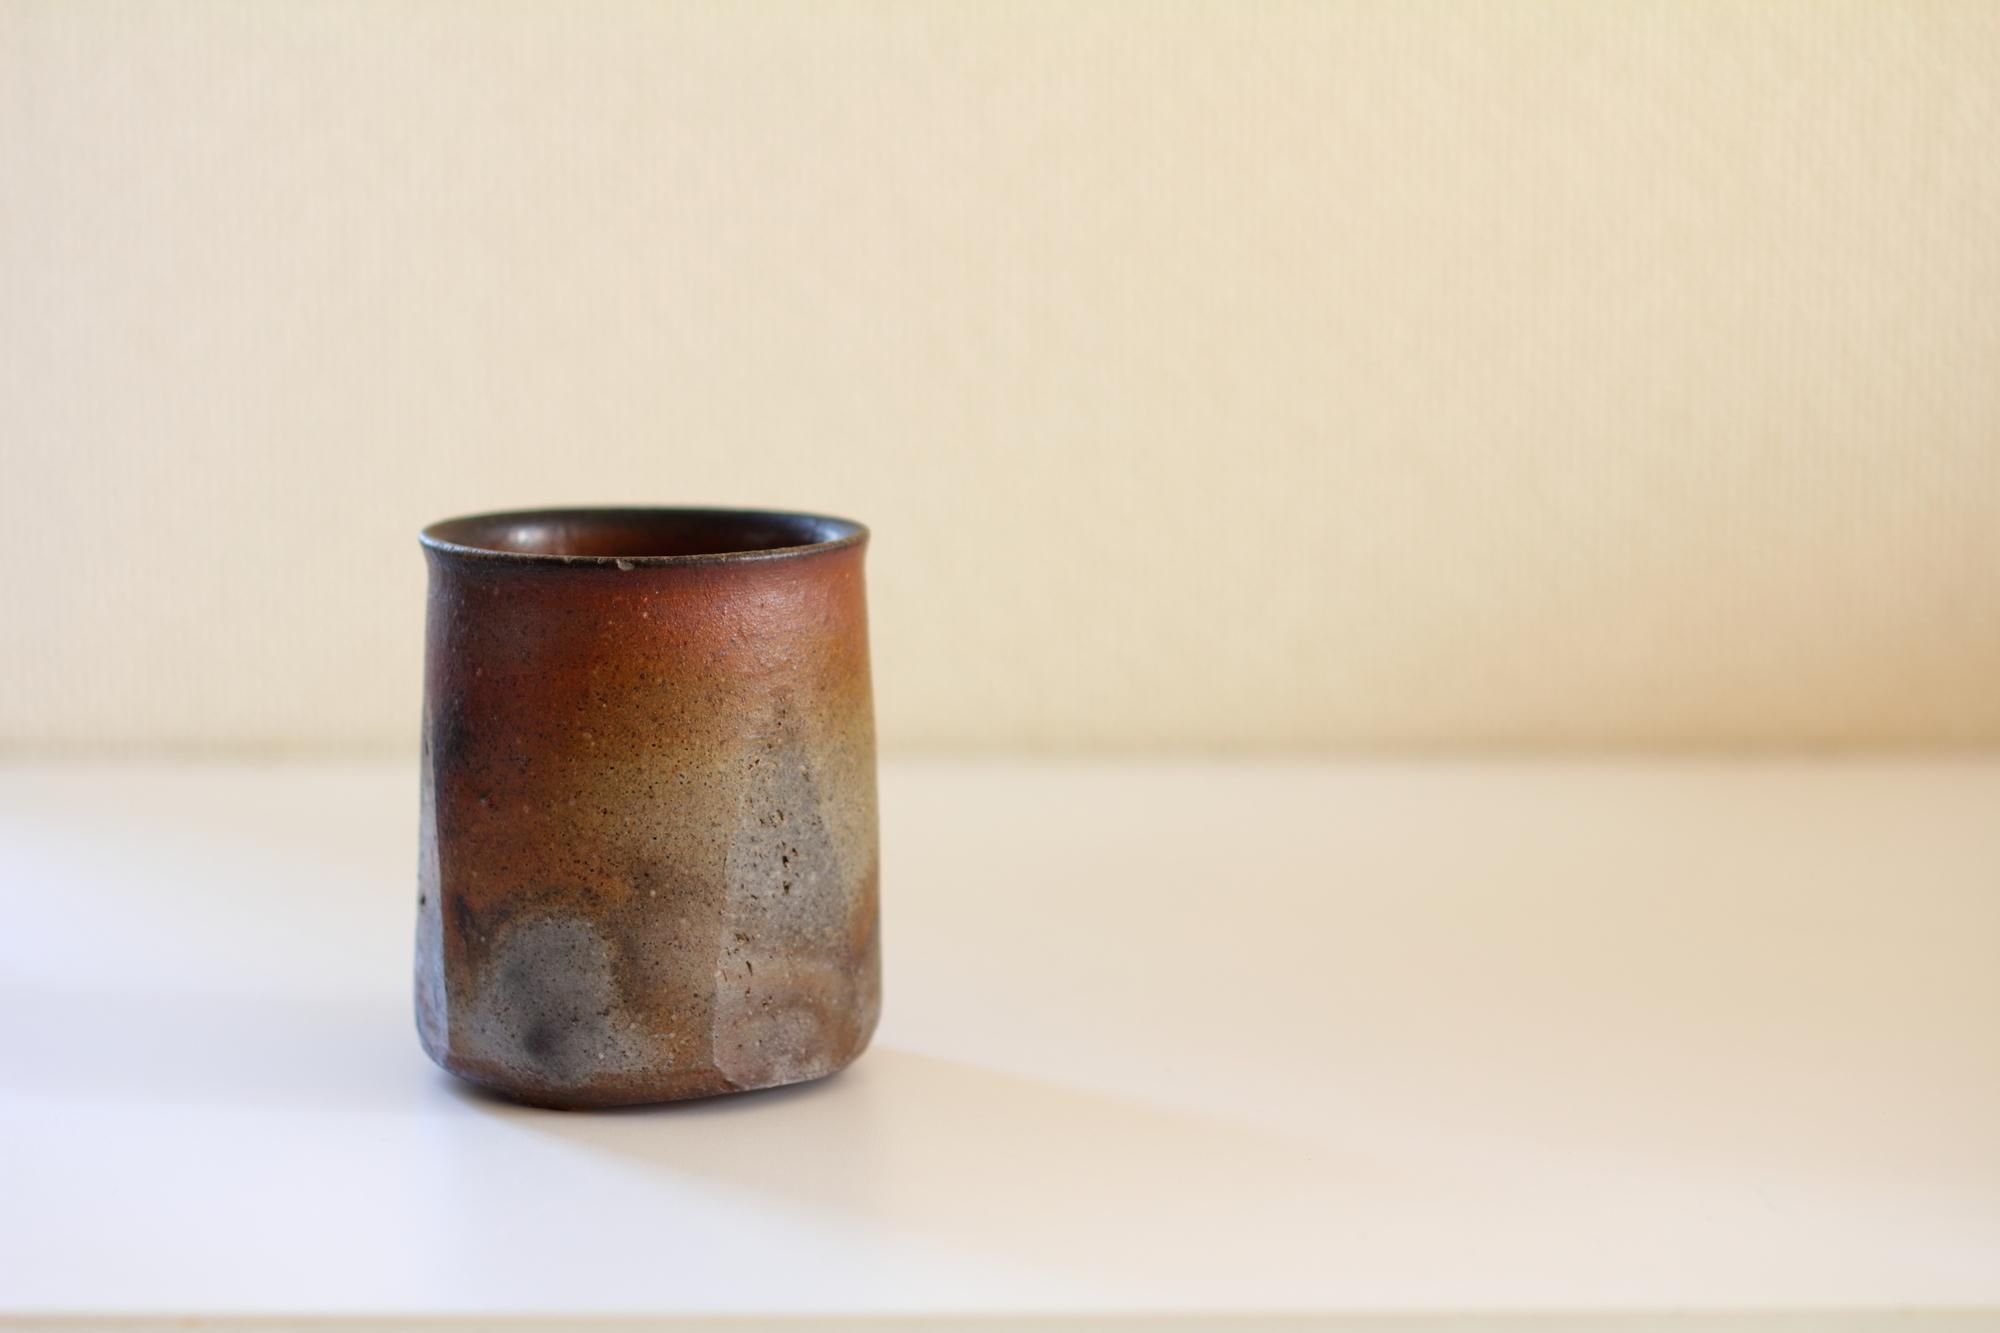 Bizen ceramics